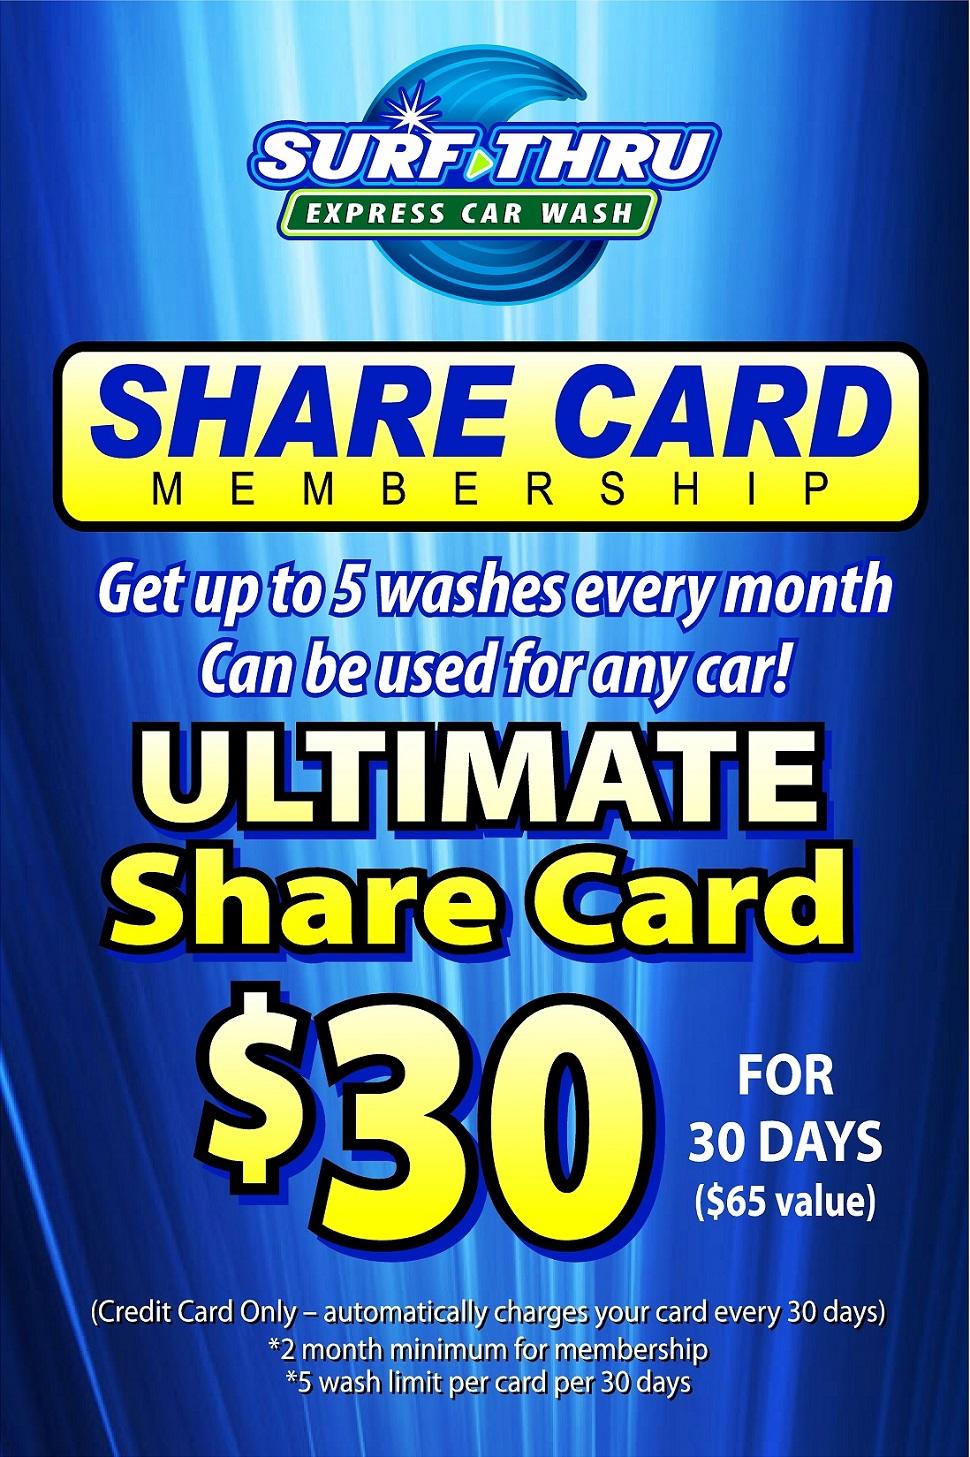 Car Wash Monthly Plans | Car Wash Share Card | Surf Thru Express Car Wash